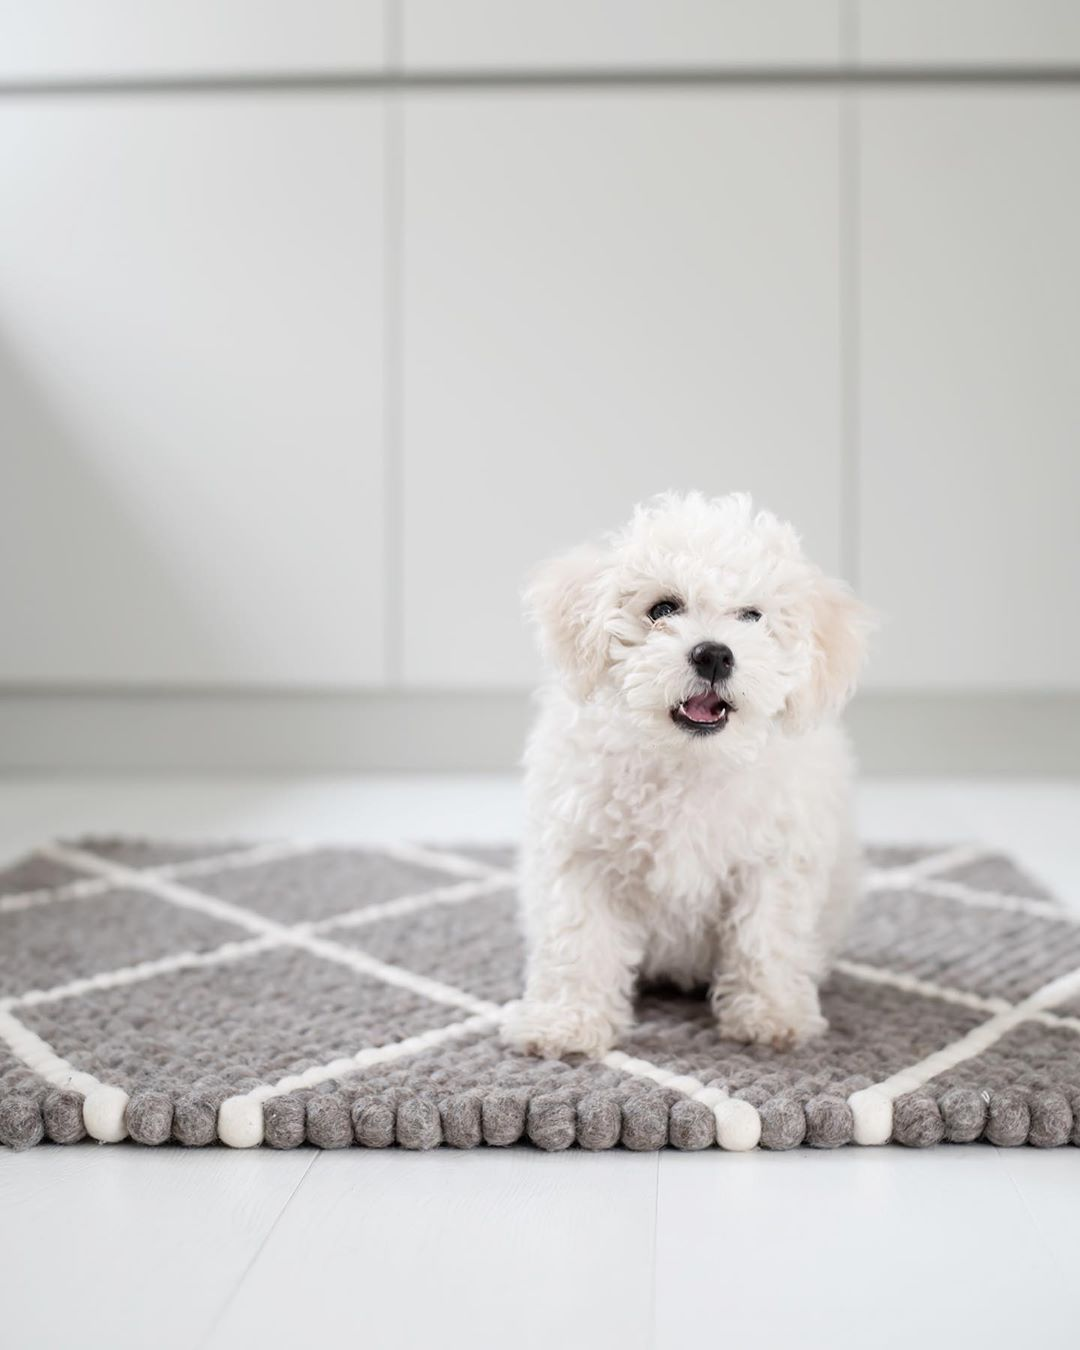 New The 10 Best Home Decor With Pictures Hi Im New Here Uusi Perheenjasenemme Esittaytyy 10 Viikkoinen Koiranp Decor Interior Design Home Art Home Goods